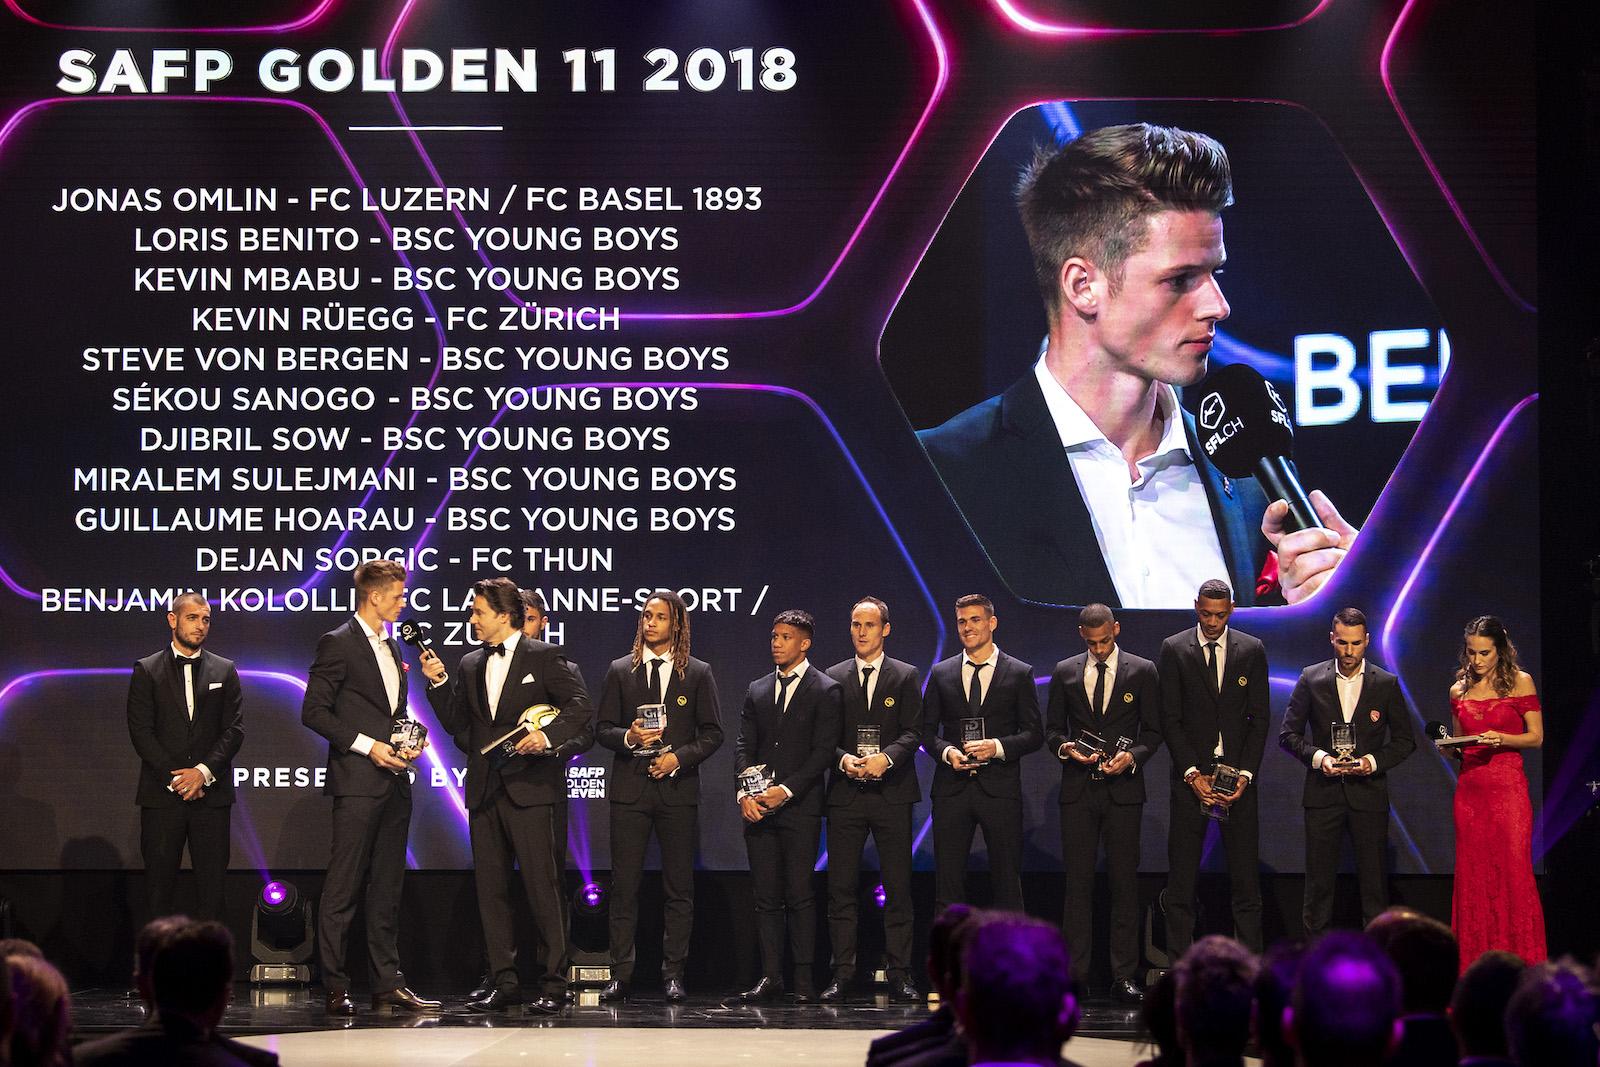 Golden11 - SAFP Golden11 2018 (COPYRIGHT Claudio de Capitani/freshfocus)